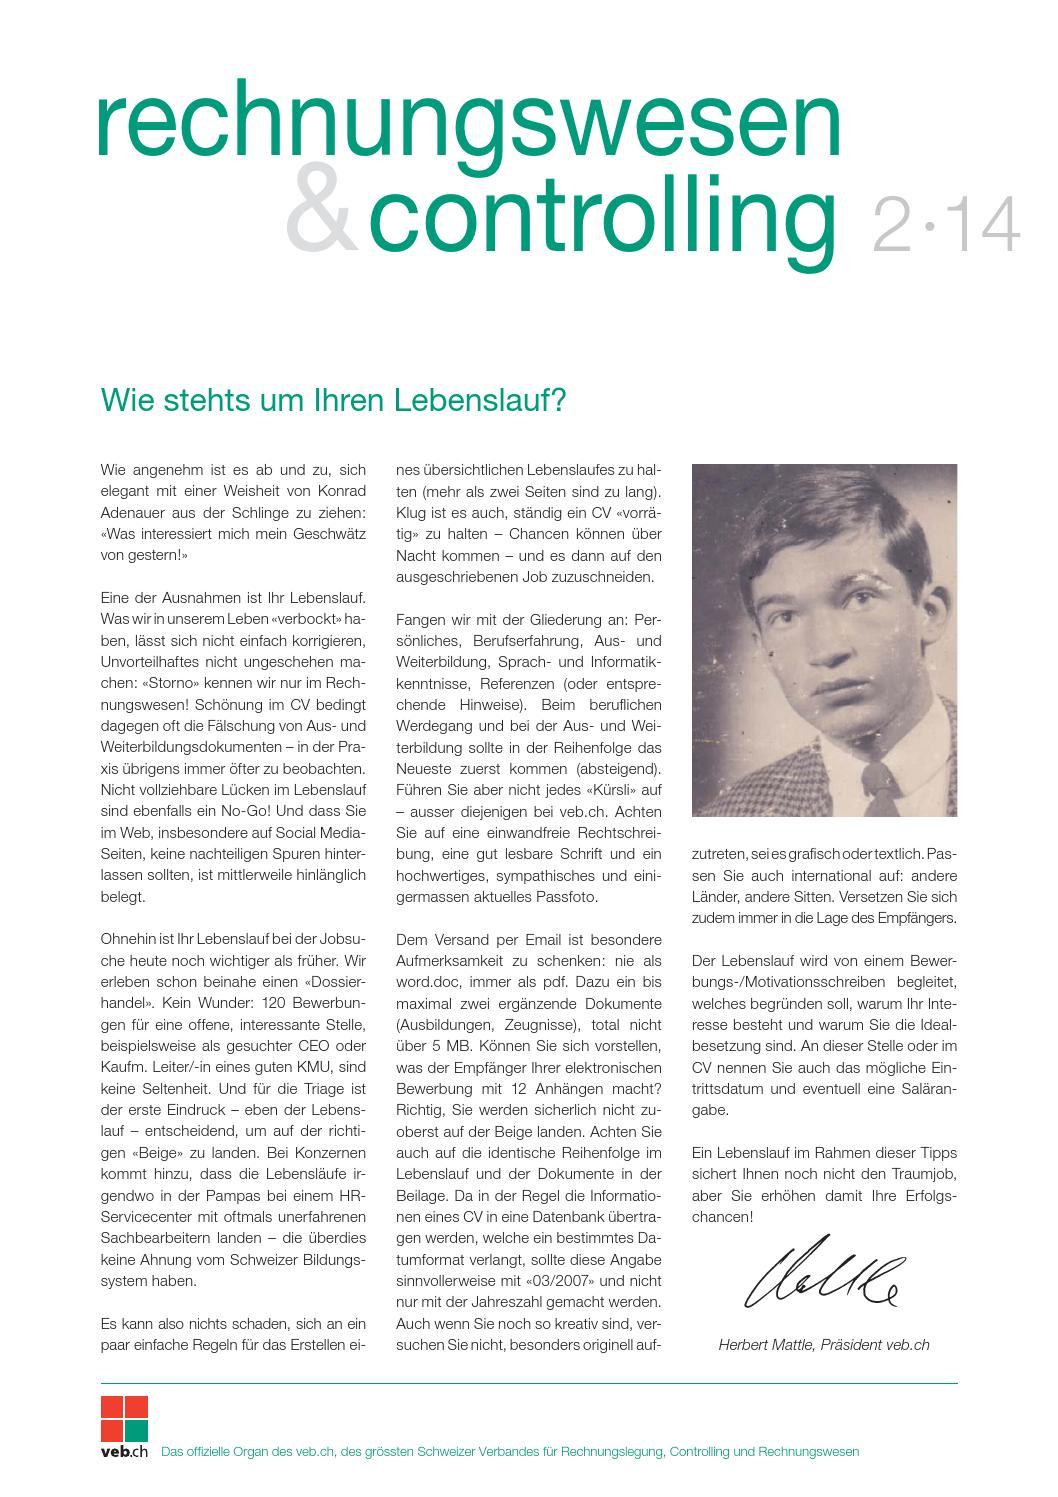 Rechnungswesen & Controlling 02/14 by daylight AG - issuu